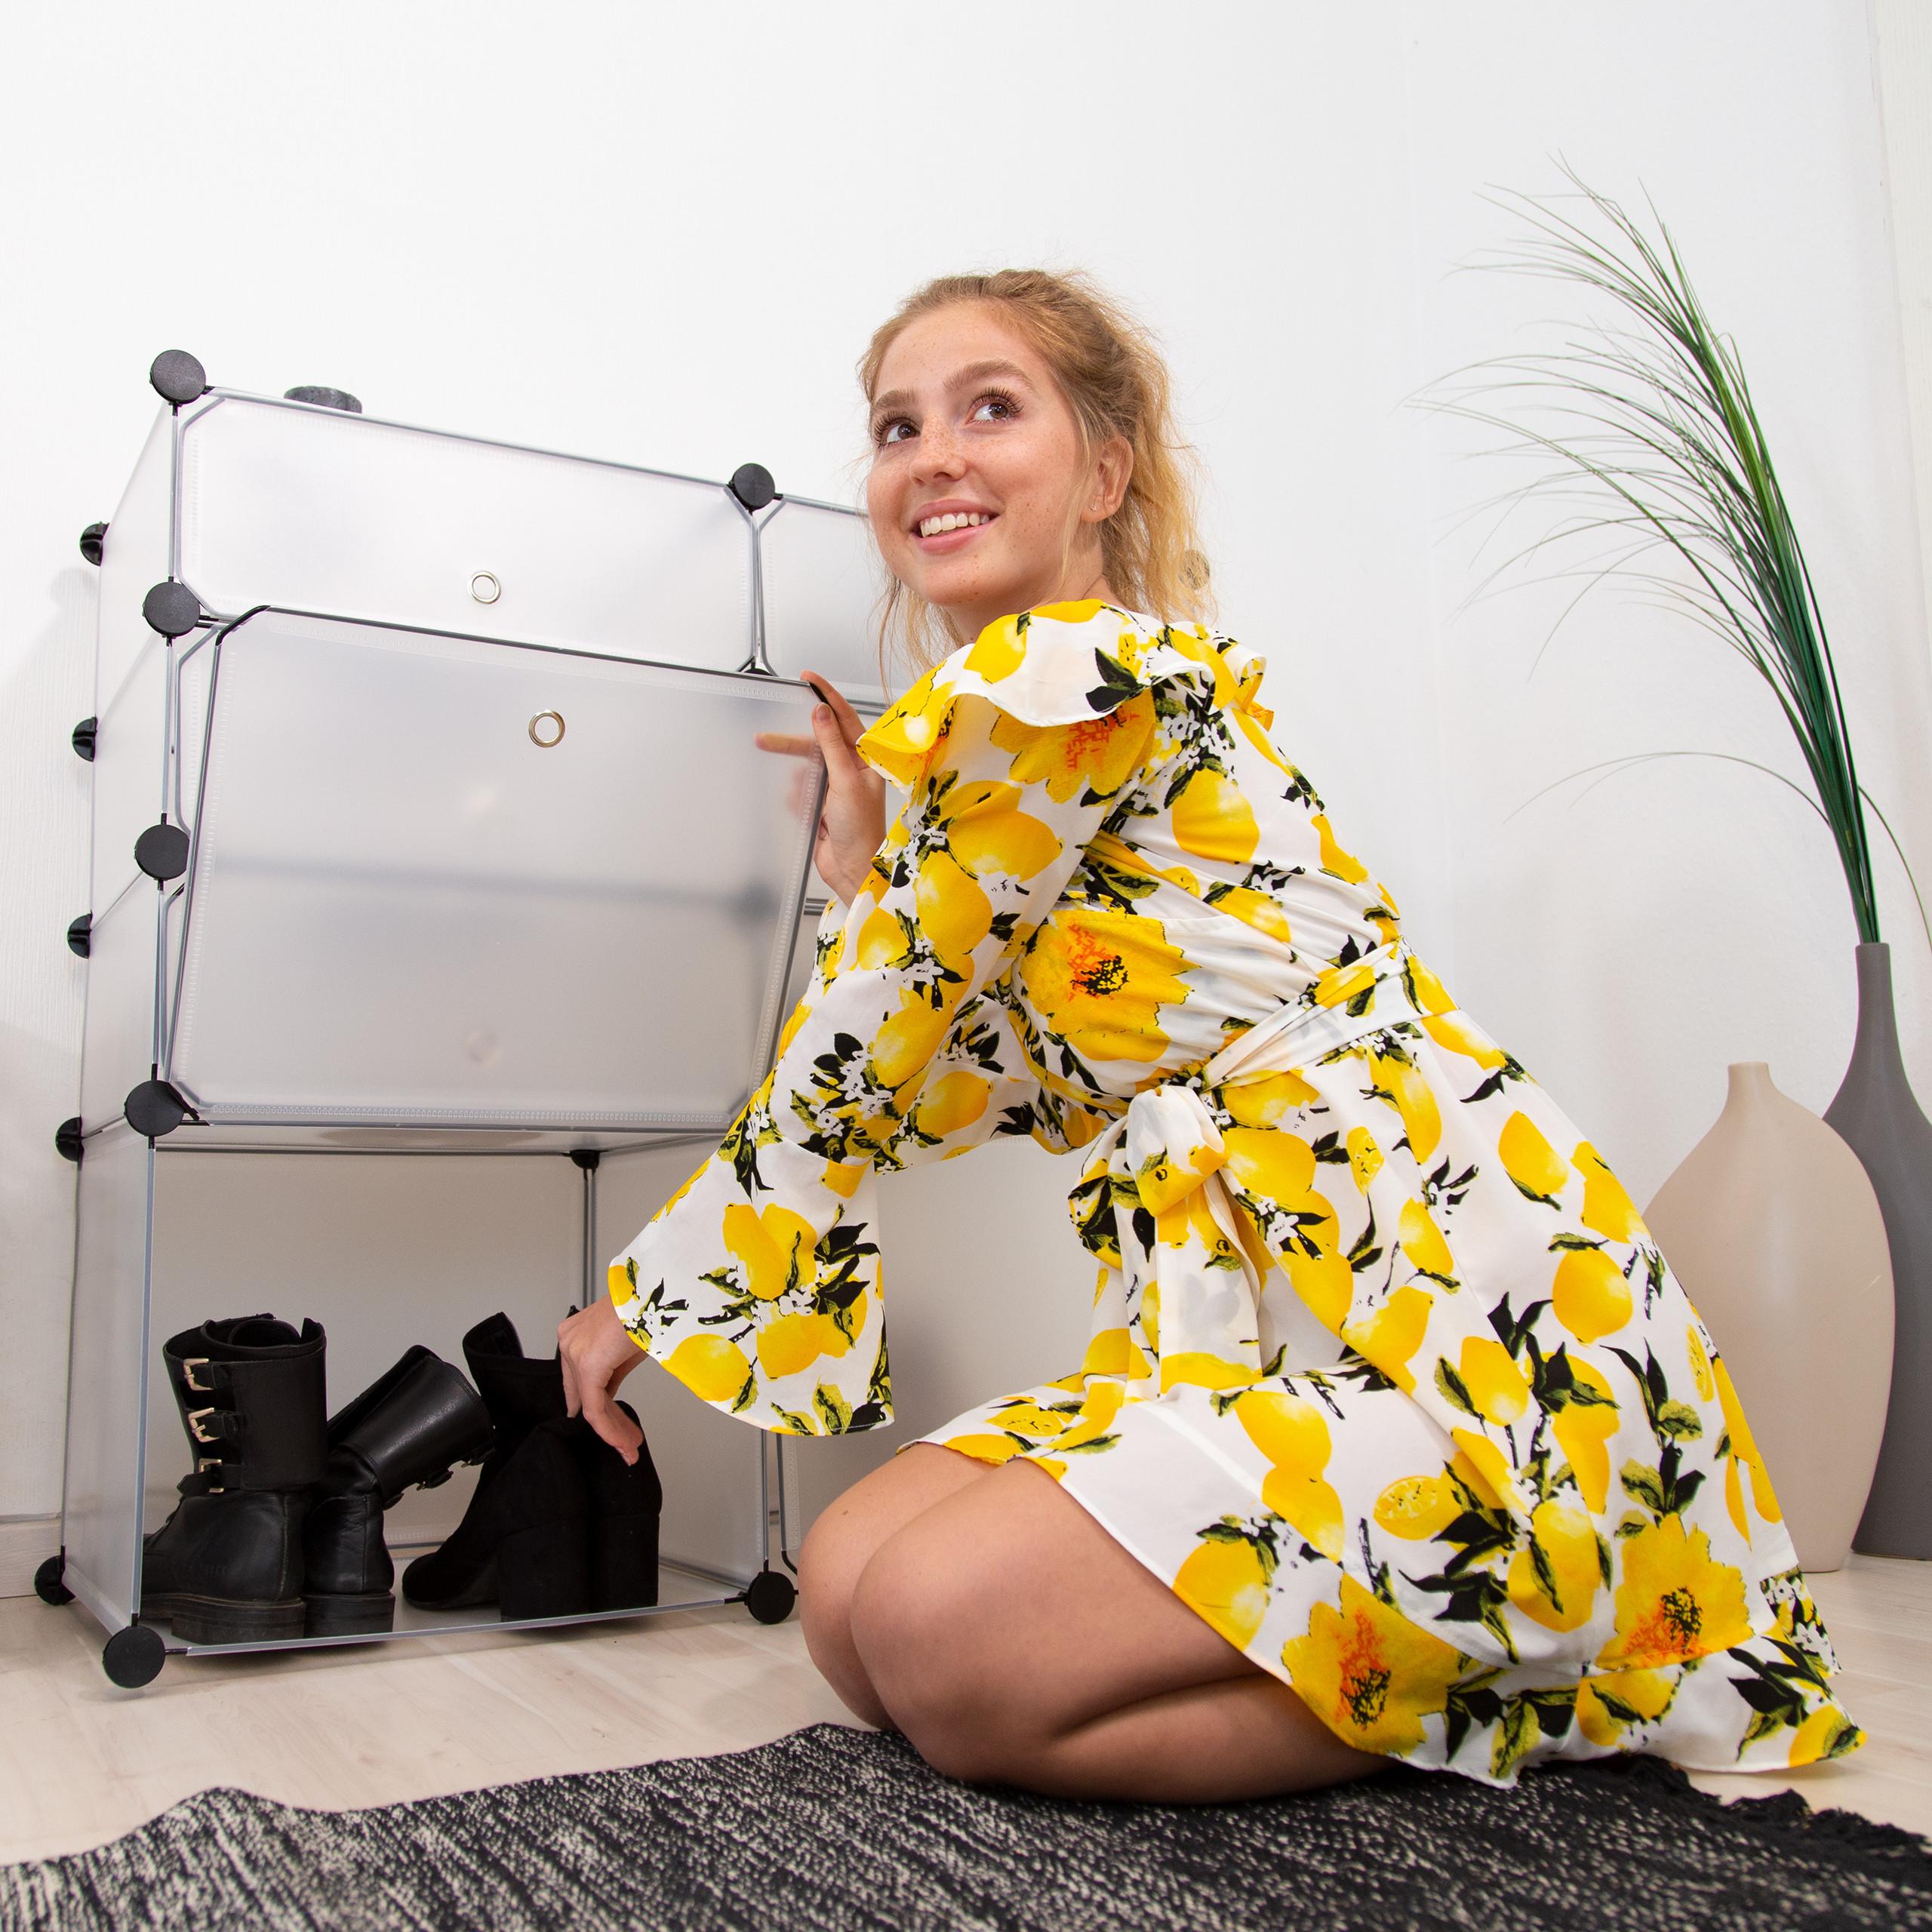 schuhregal kunststoff 8 f cher schuhschrank steckregal mit. Black Bedroom Furniture Sets. Home Design Ideas